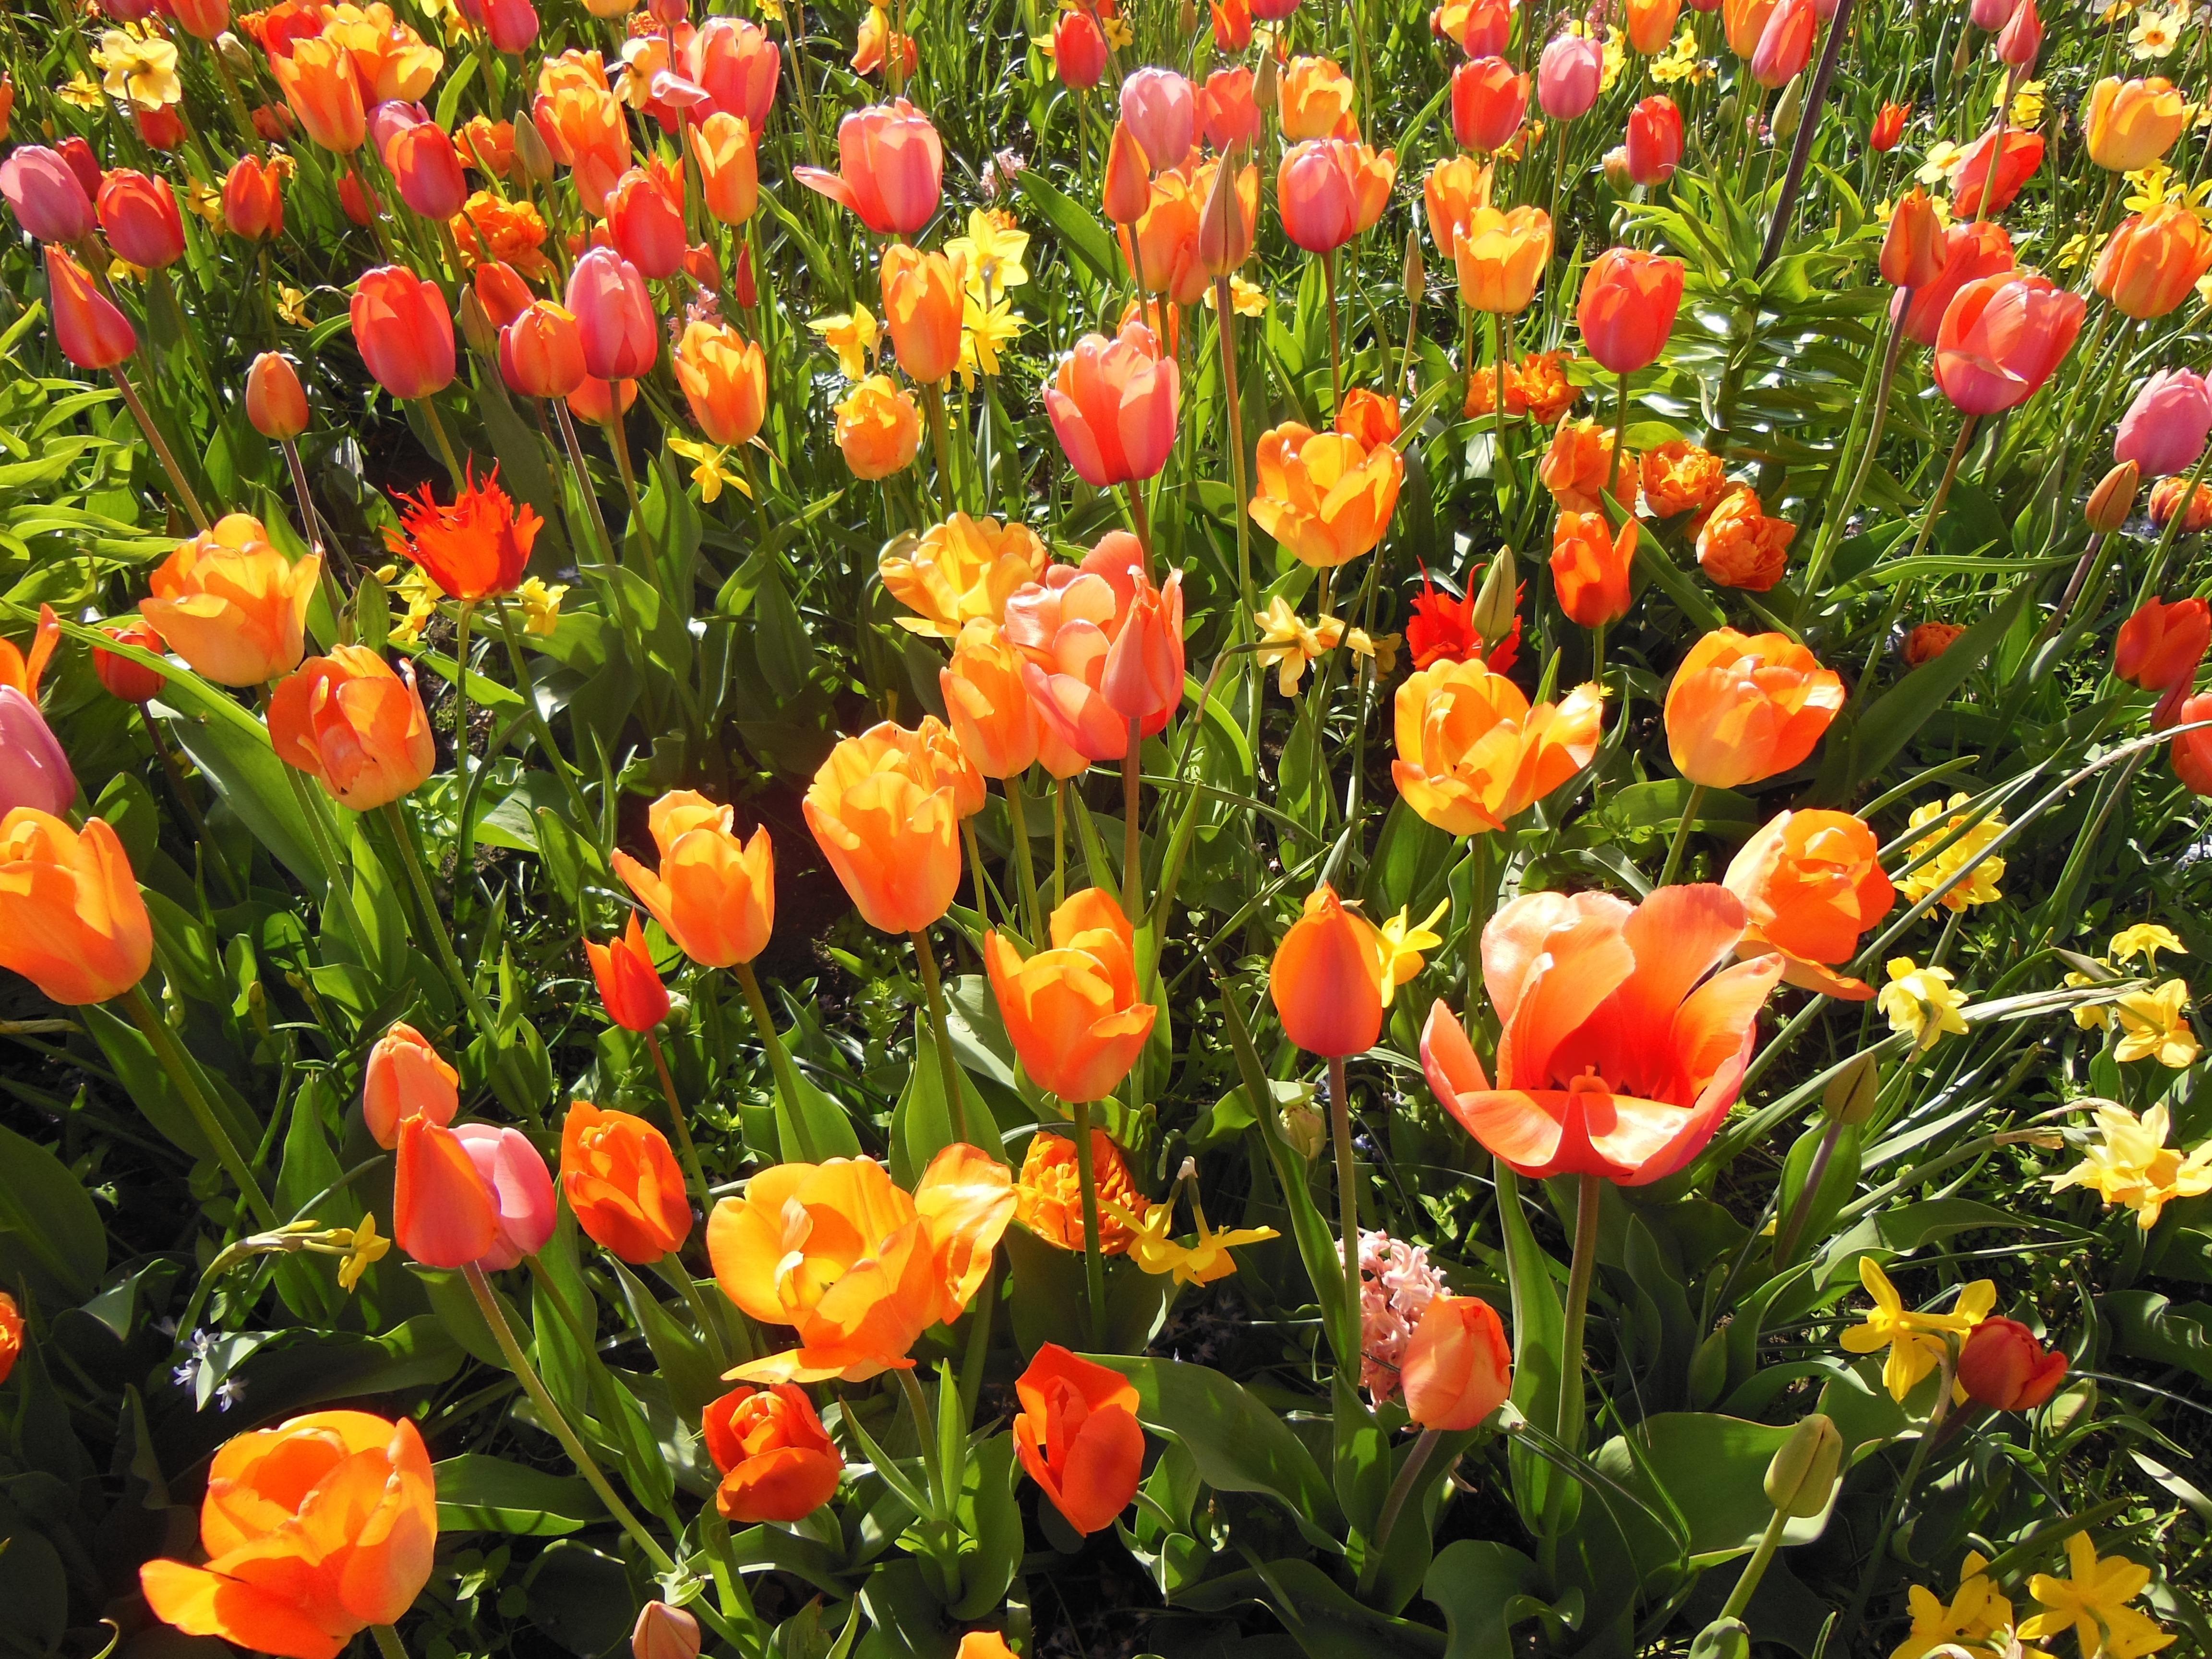 Free Images Sunshine Flower Summer Tulip Green Garden